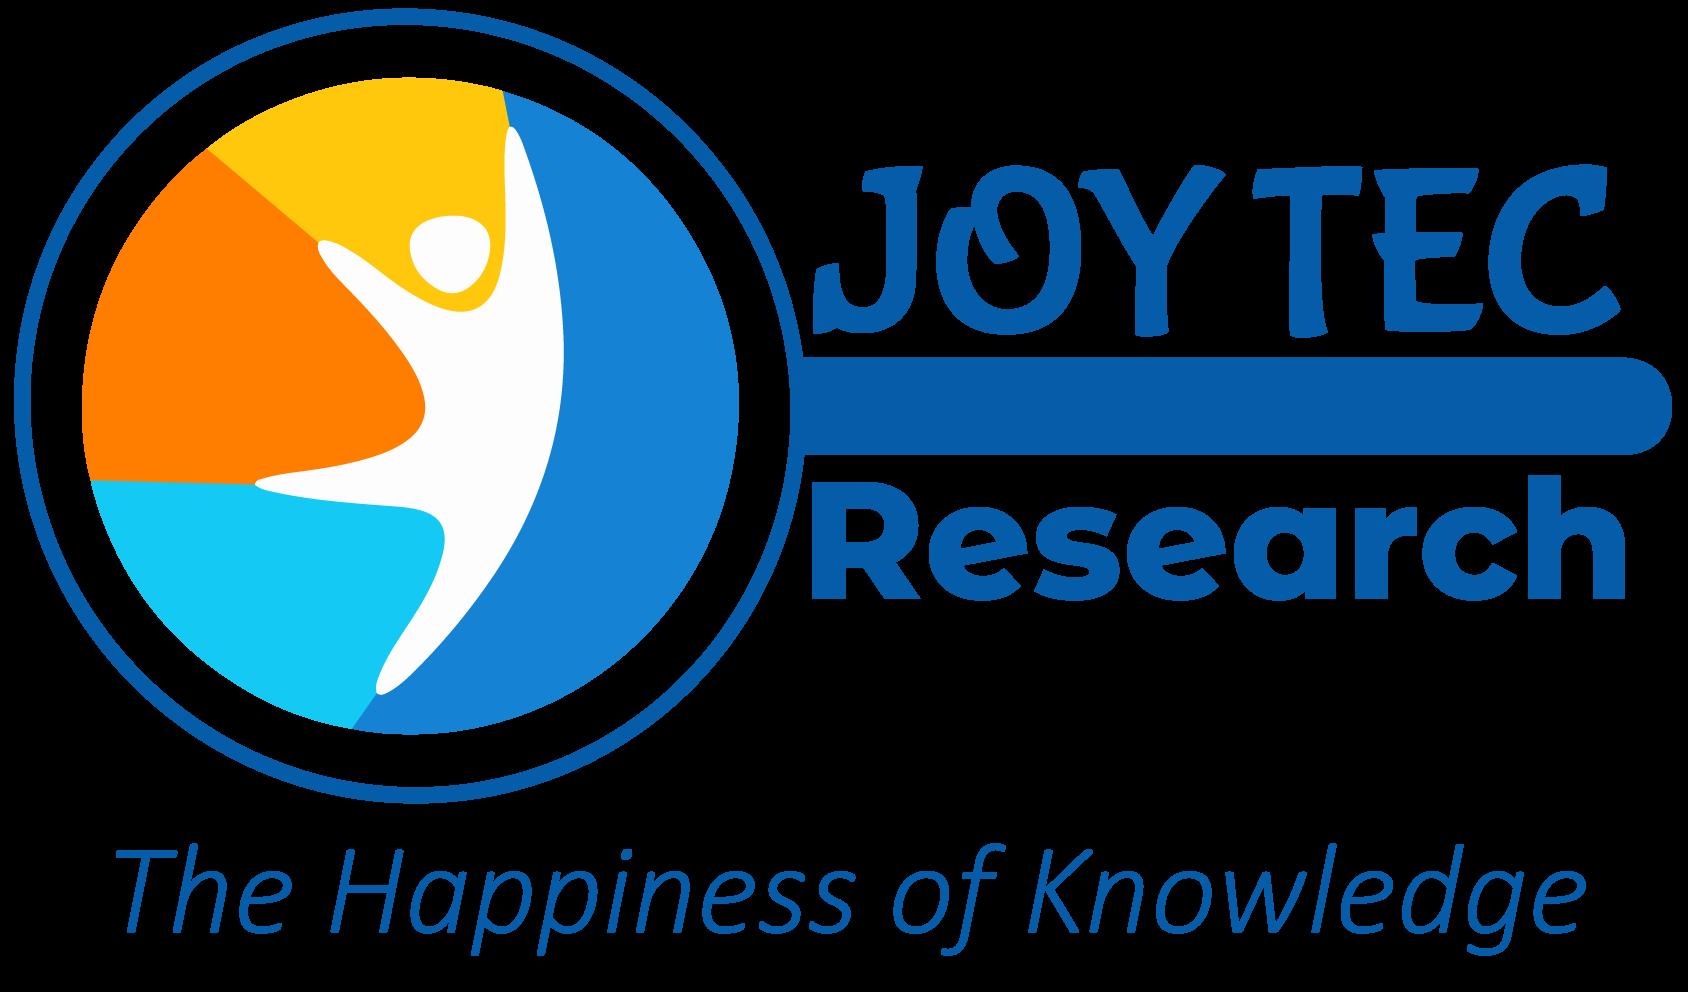 joytec-logo-with-slogan